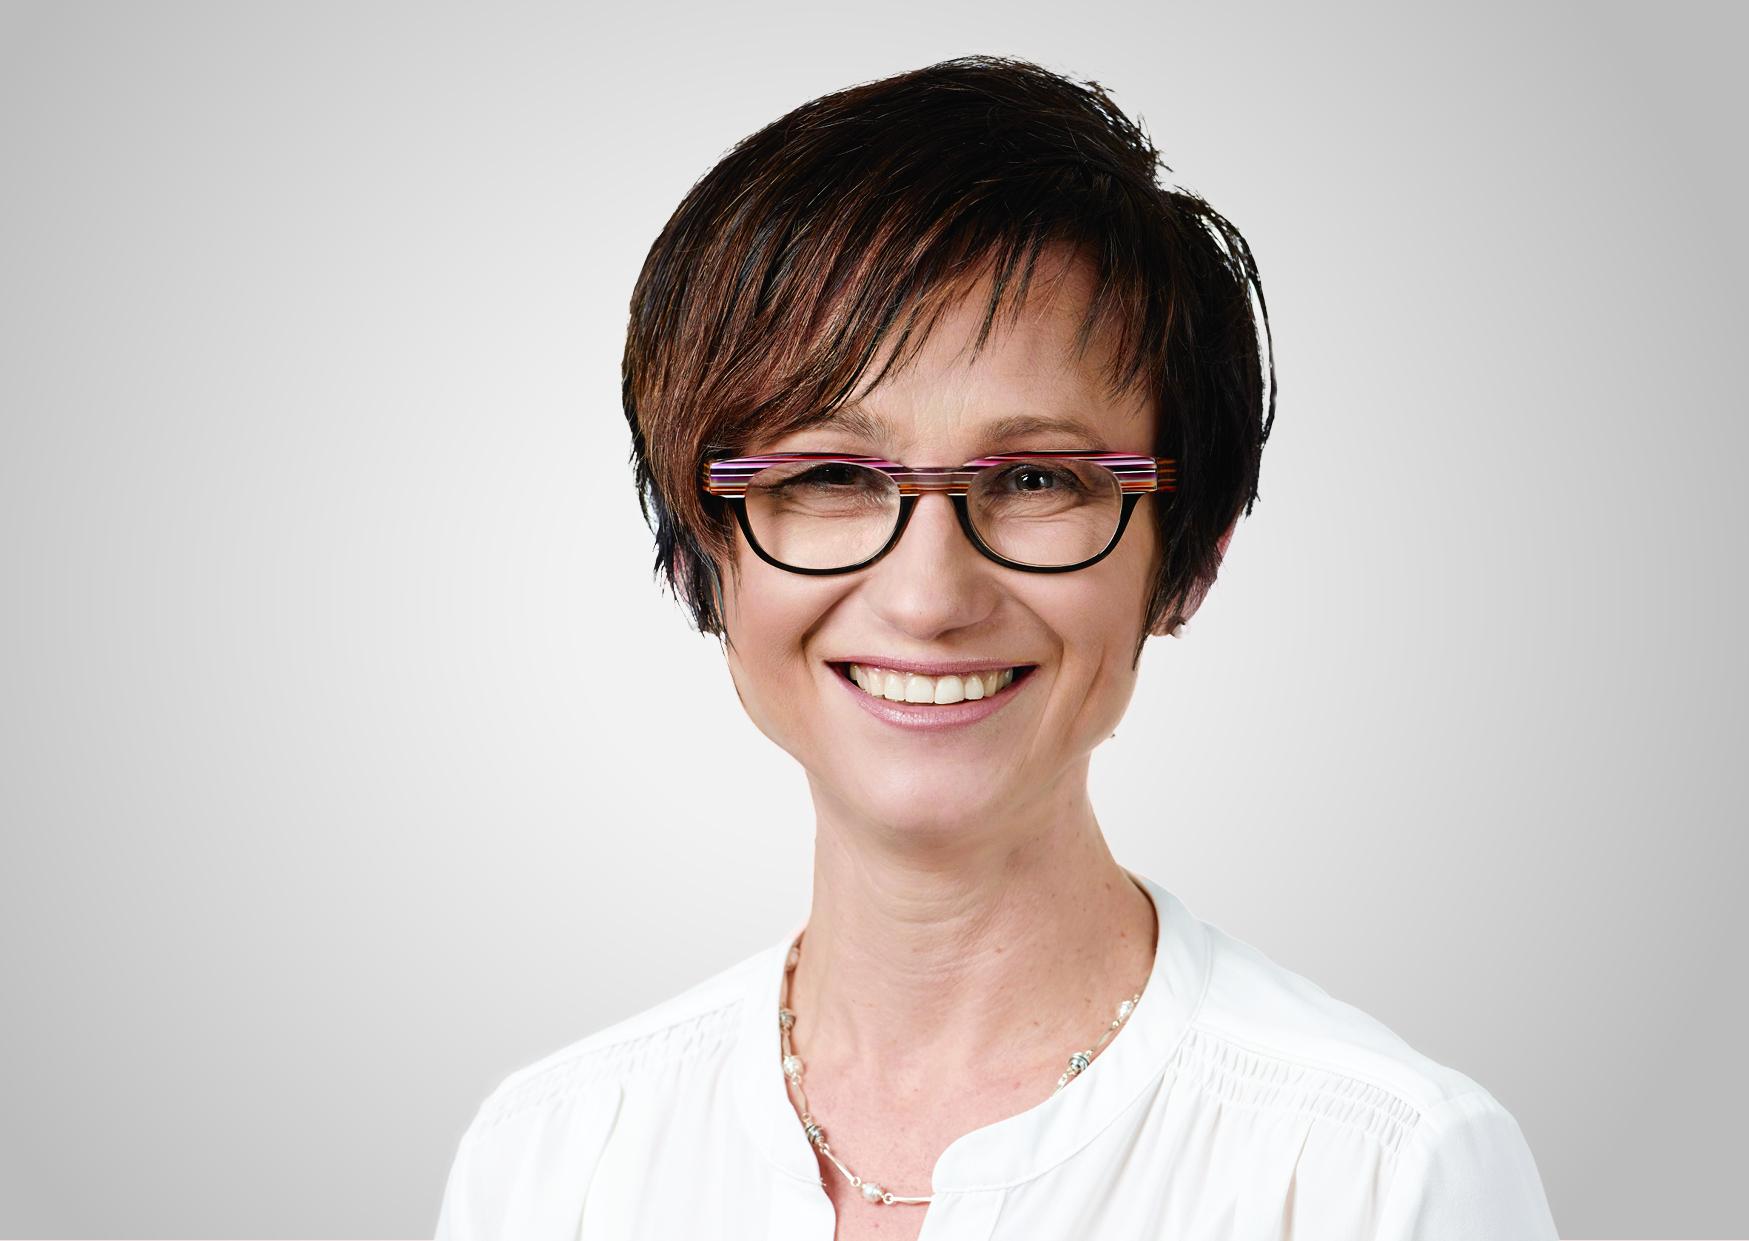 Ines Becker-Hansen